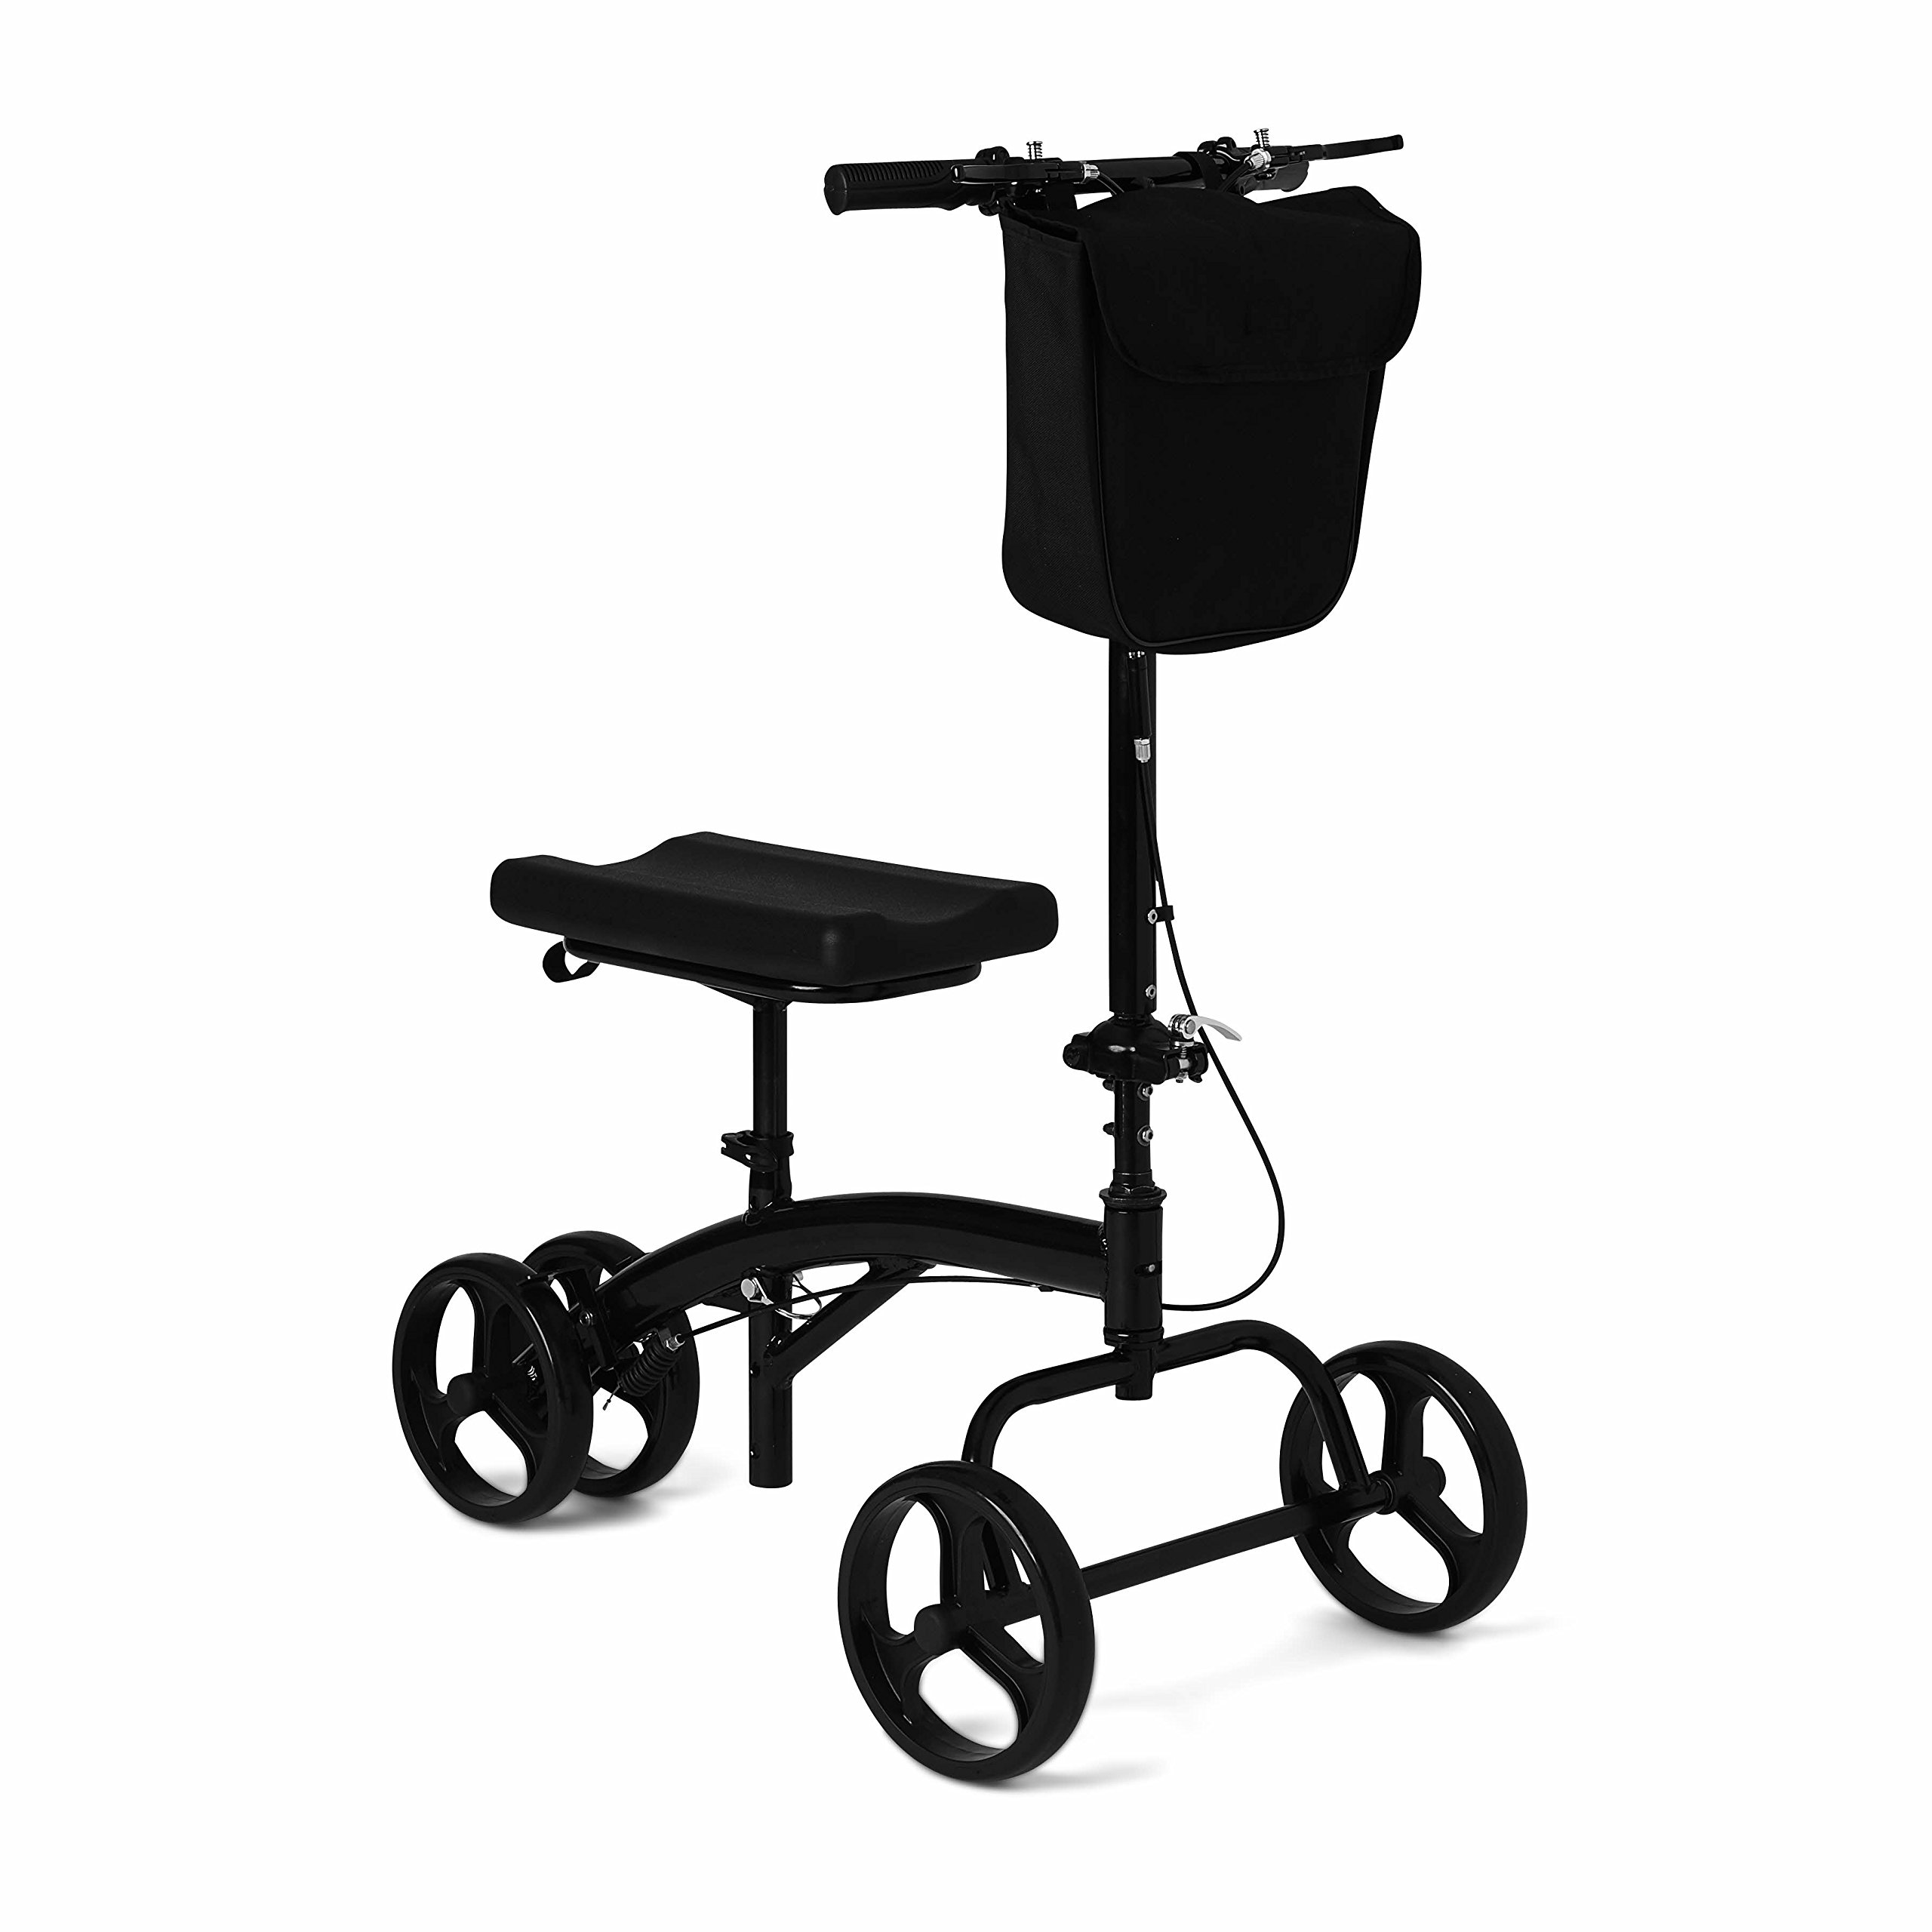 Healthcare Direct 100KW Steering Knee Walker with Hand Brakes, Basket Adjustable Height